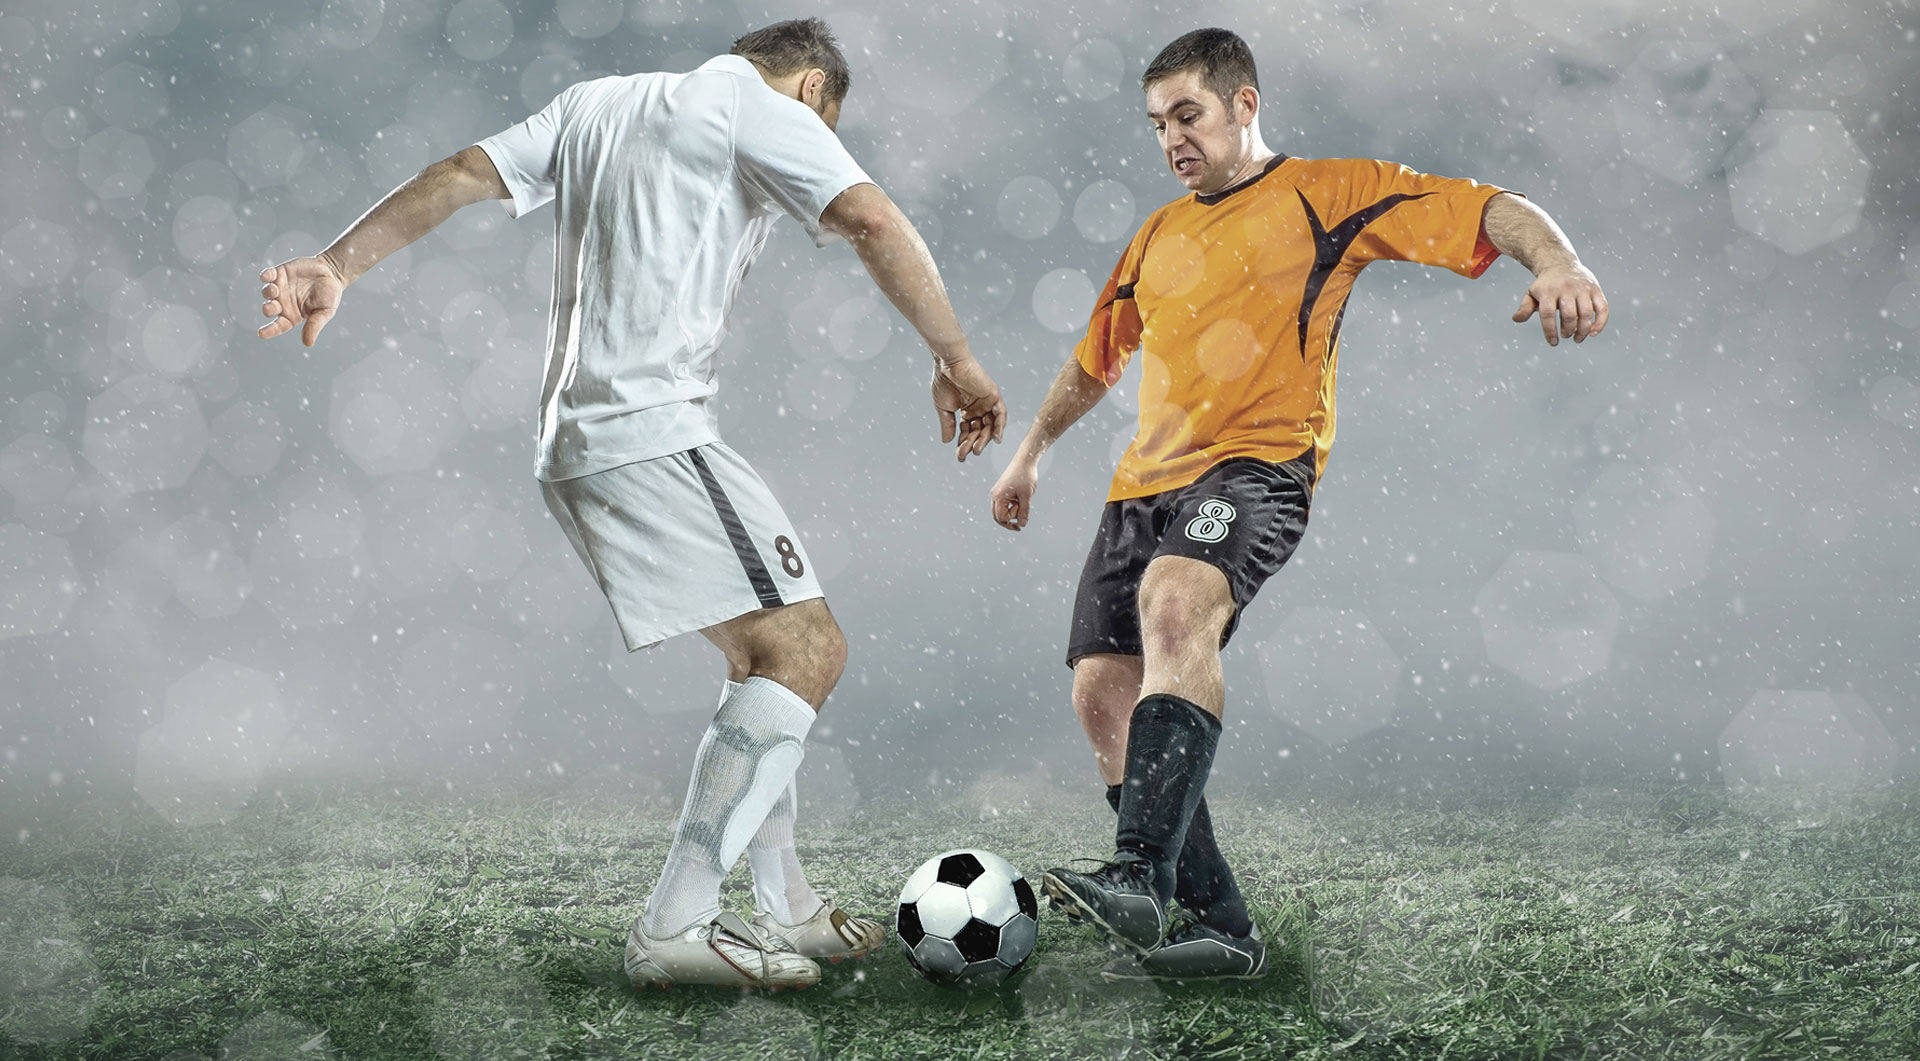 switzerland-vs-united-states-1st-round-hd-live